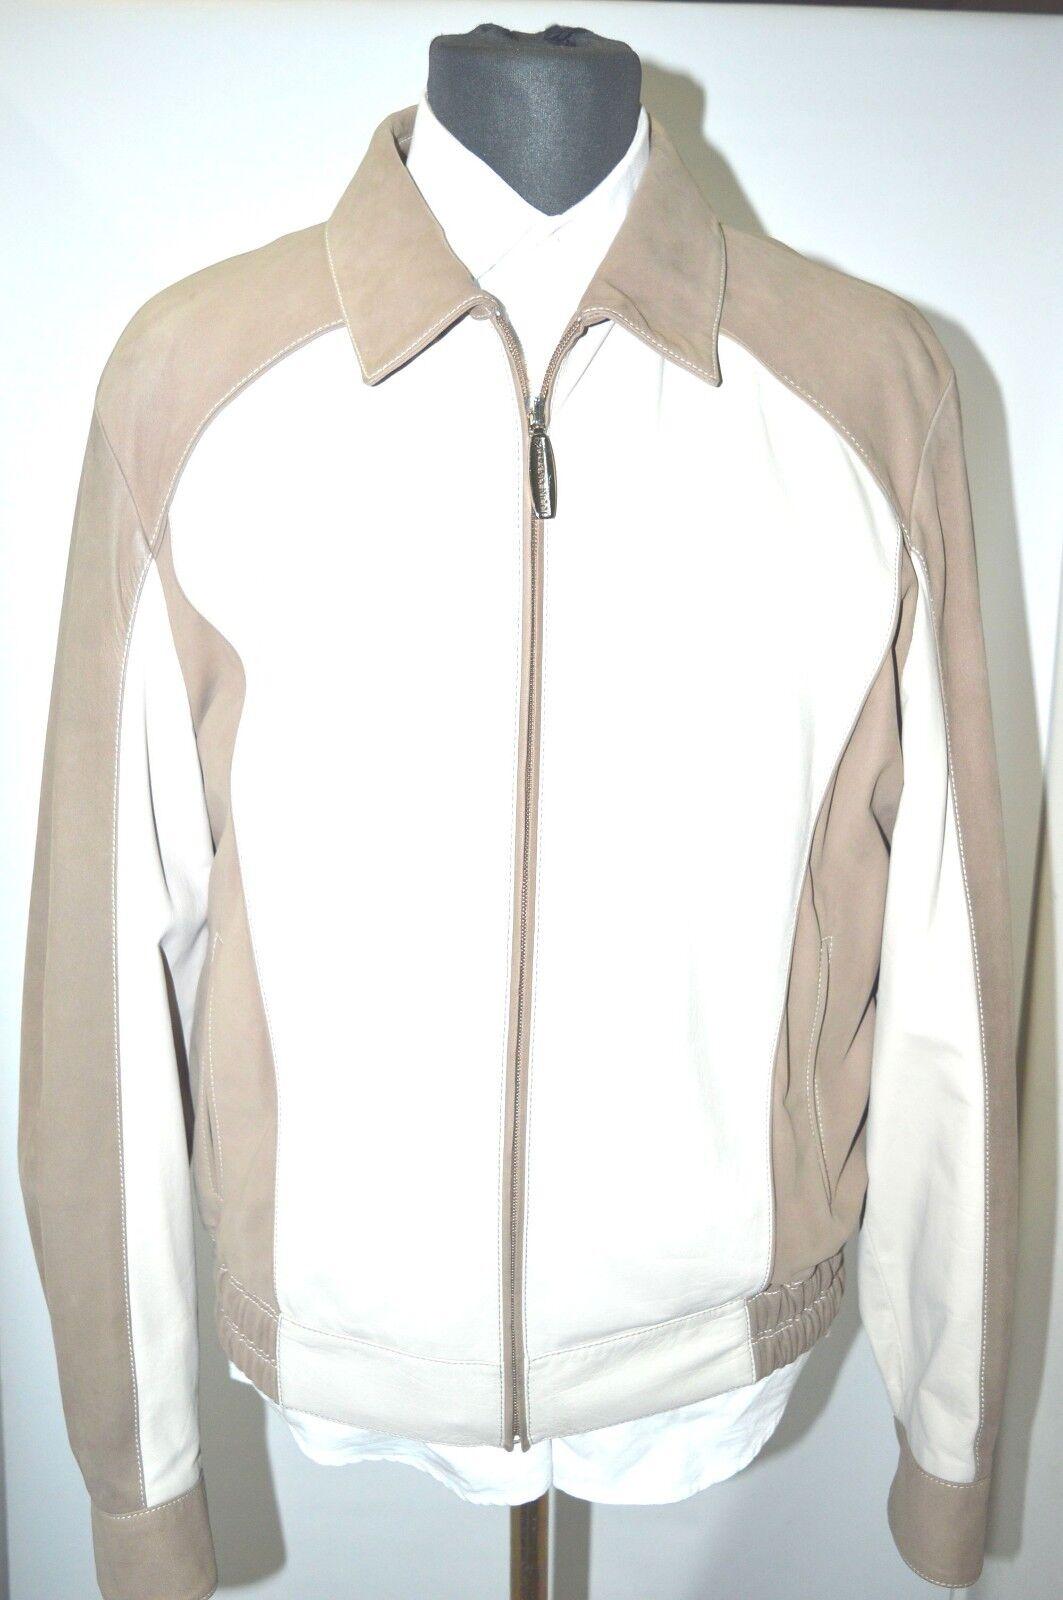 NEW 7950,00  STEFANO RICCI  Outwear   Leder Coat Größe Us S Eu 48 (G13)